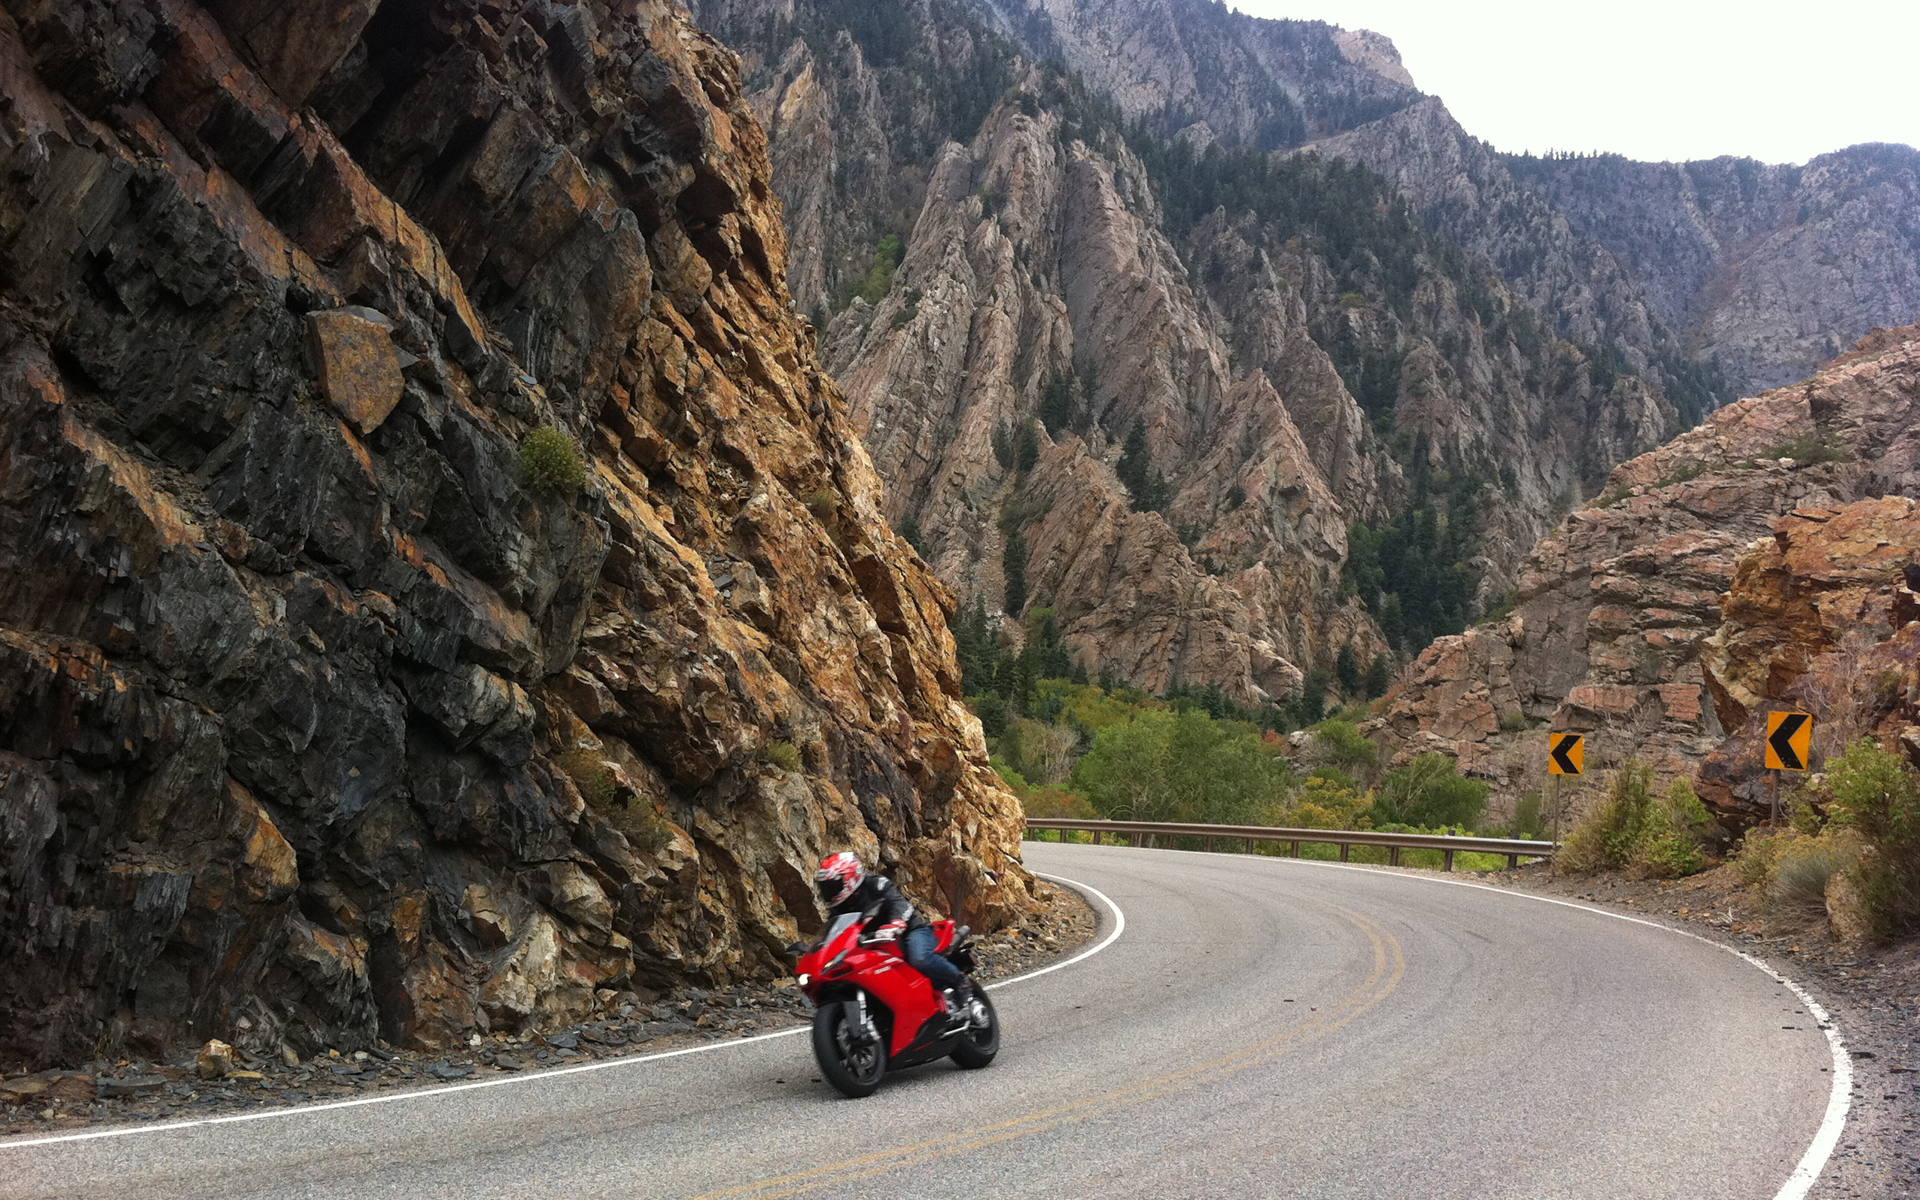 Wallpaper Hd Ducati Ducati 848 Big Cottonwood Canyon Hd Wallpaper Background